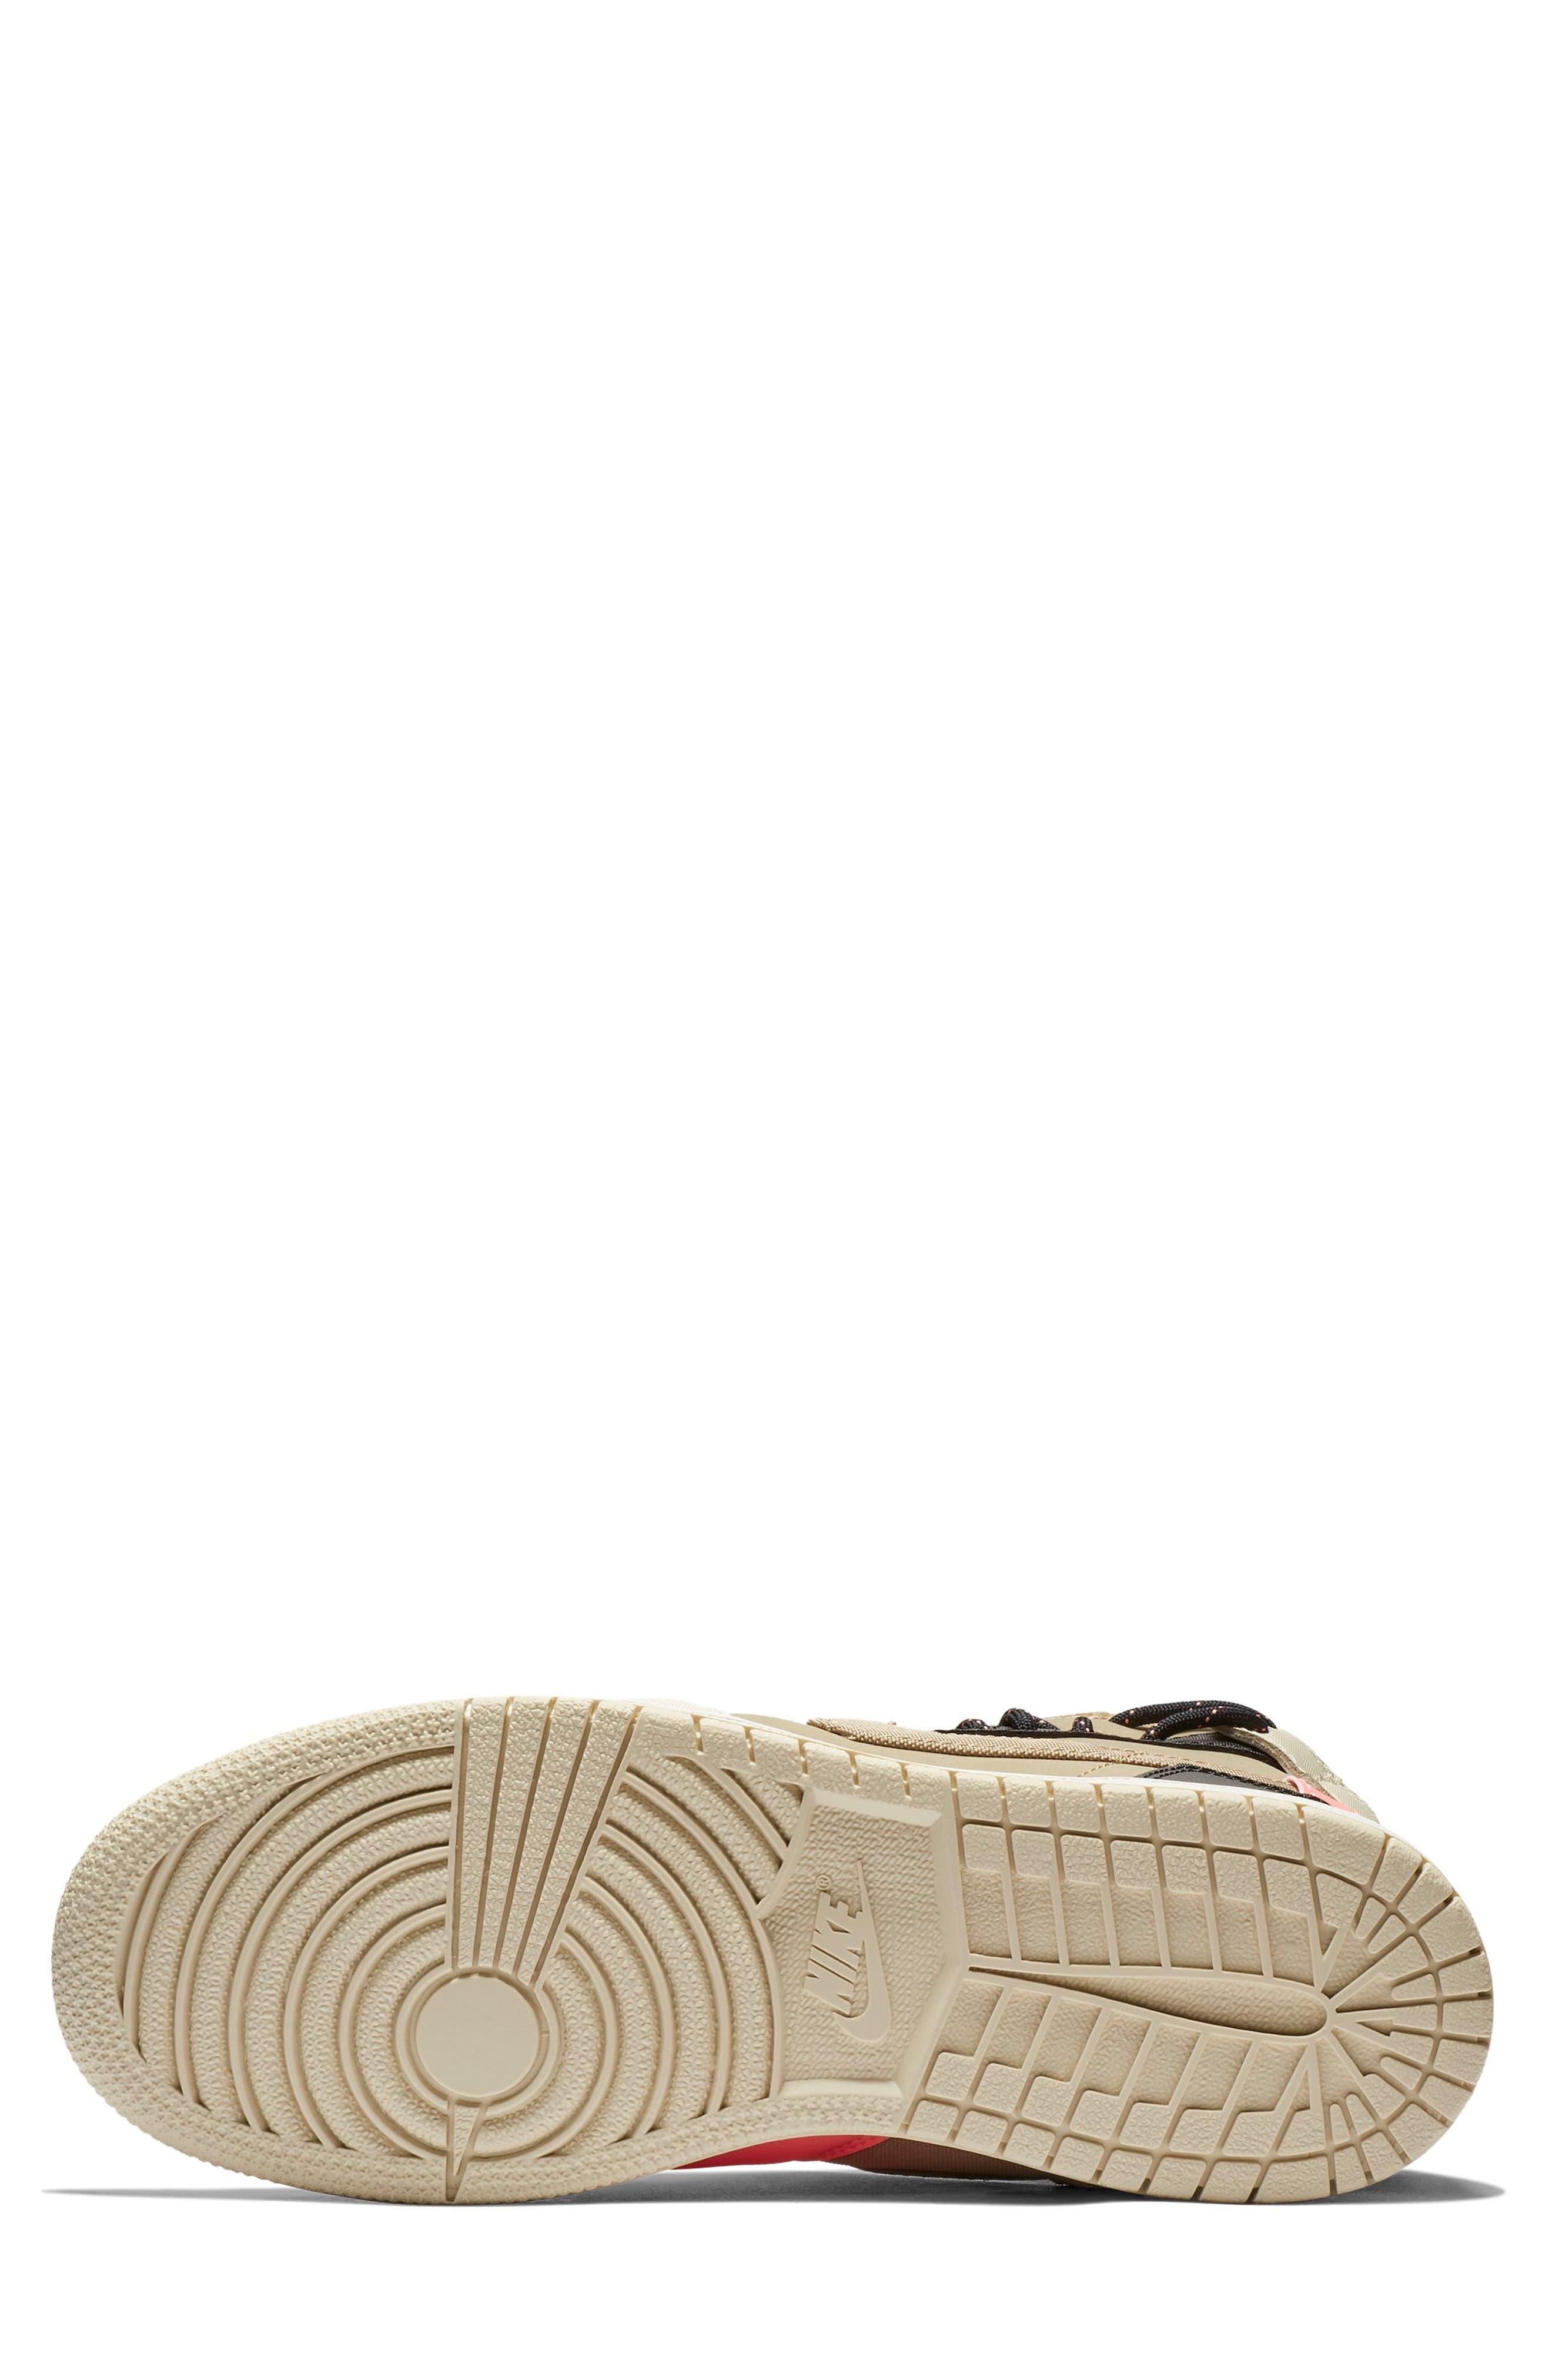 Air Jordan 1 Rebel XX Utility High Top Sneaker,                             Alternate thumbnail 5, color,                             PARACHUTE BEIGE